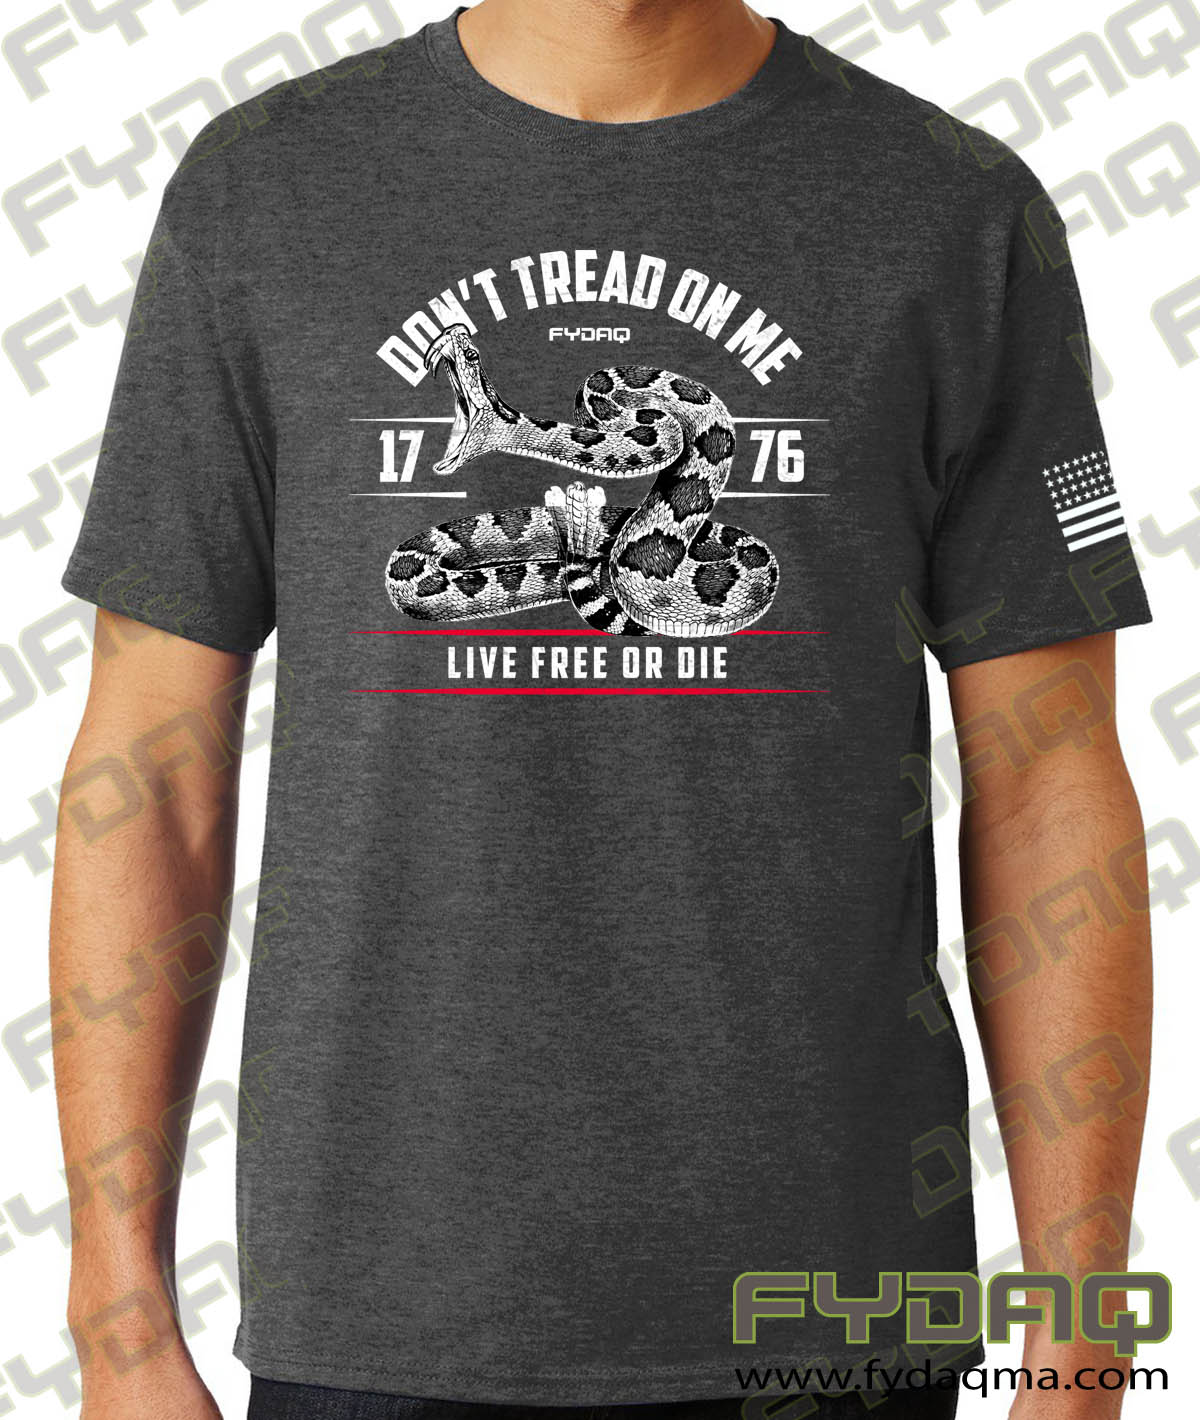 dont-tread-on-me-charcoal-heather-grey-tshirt-fydaq